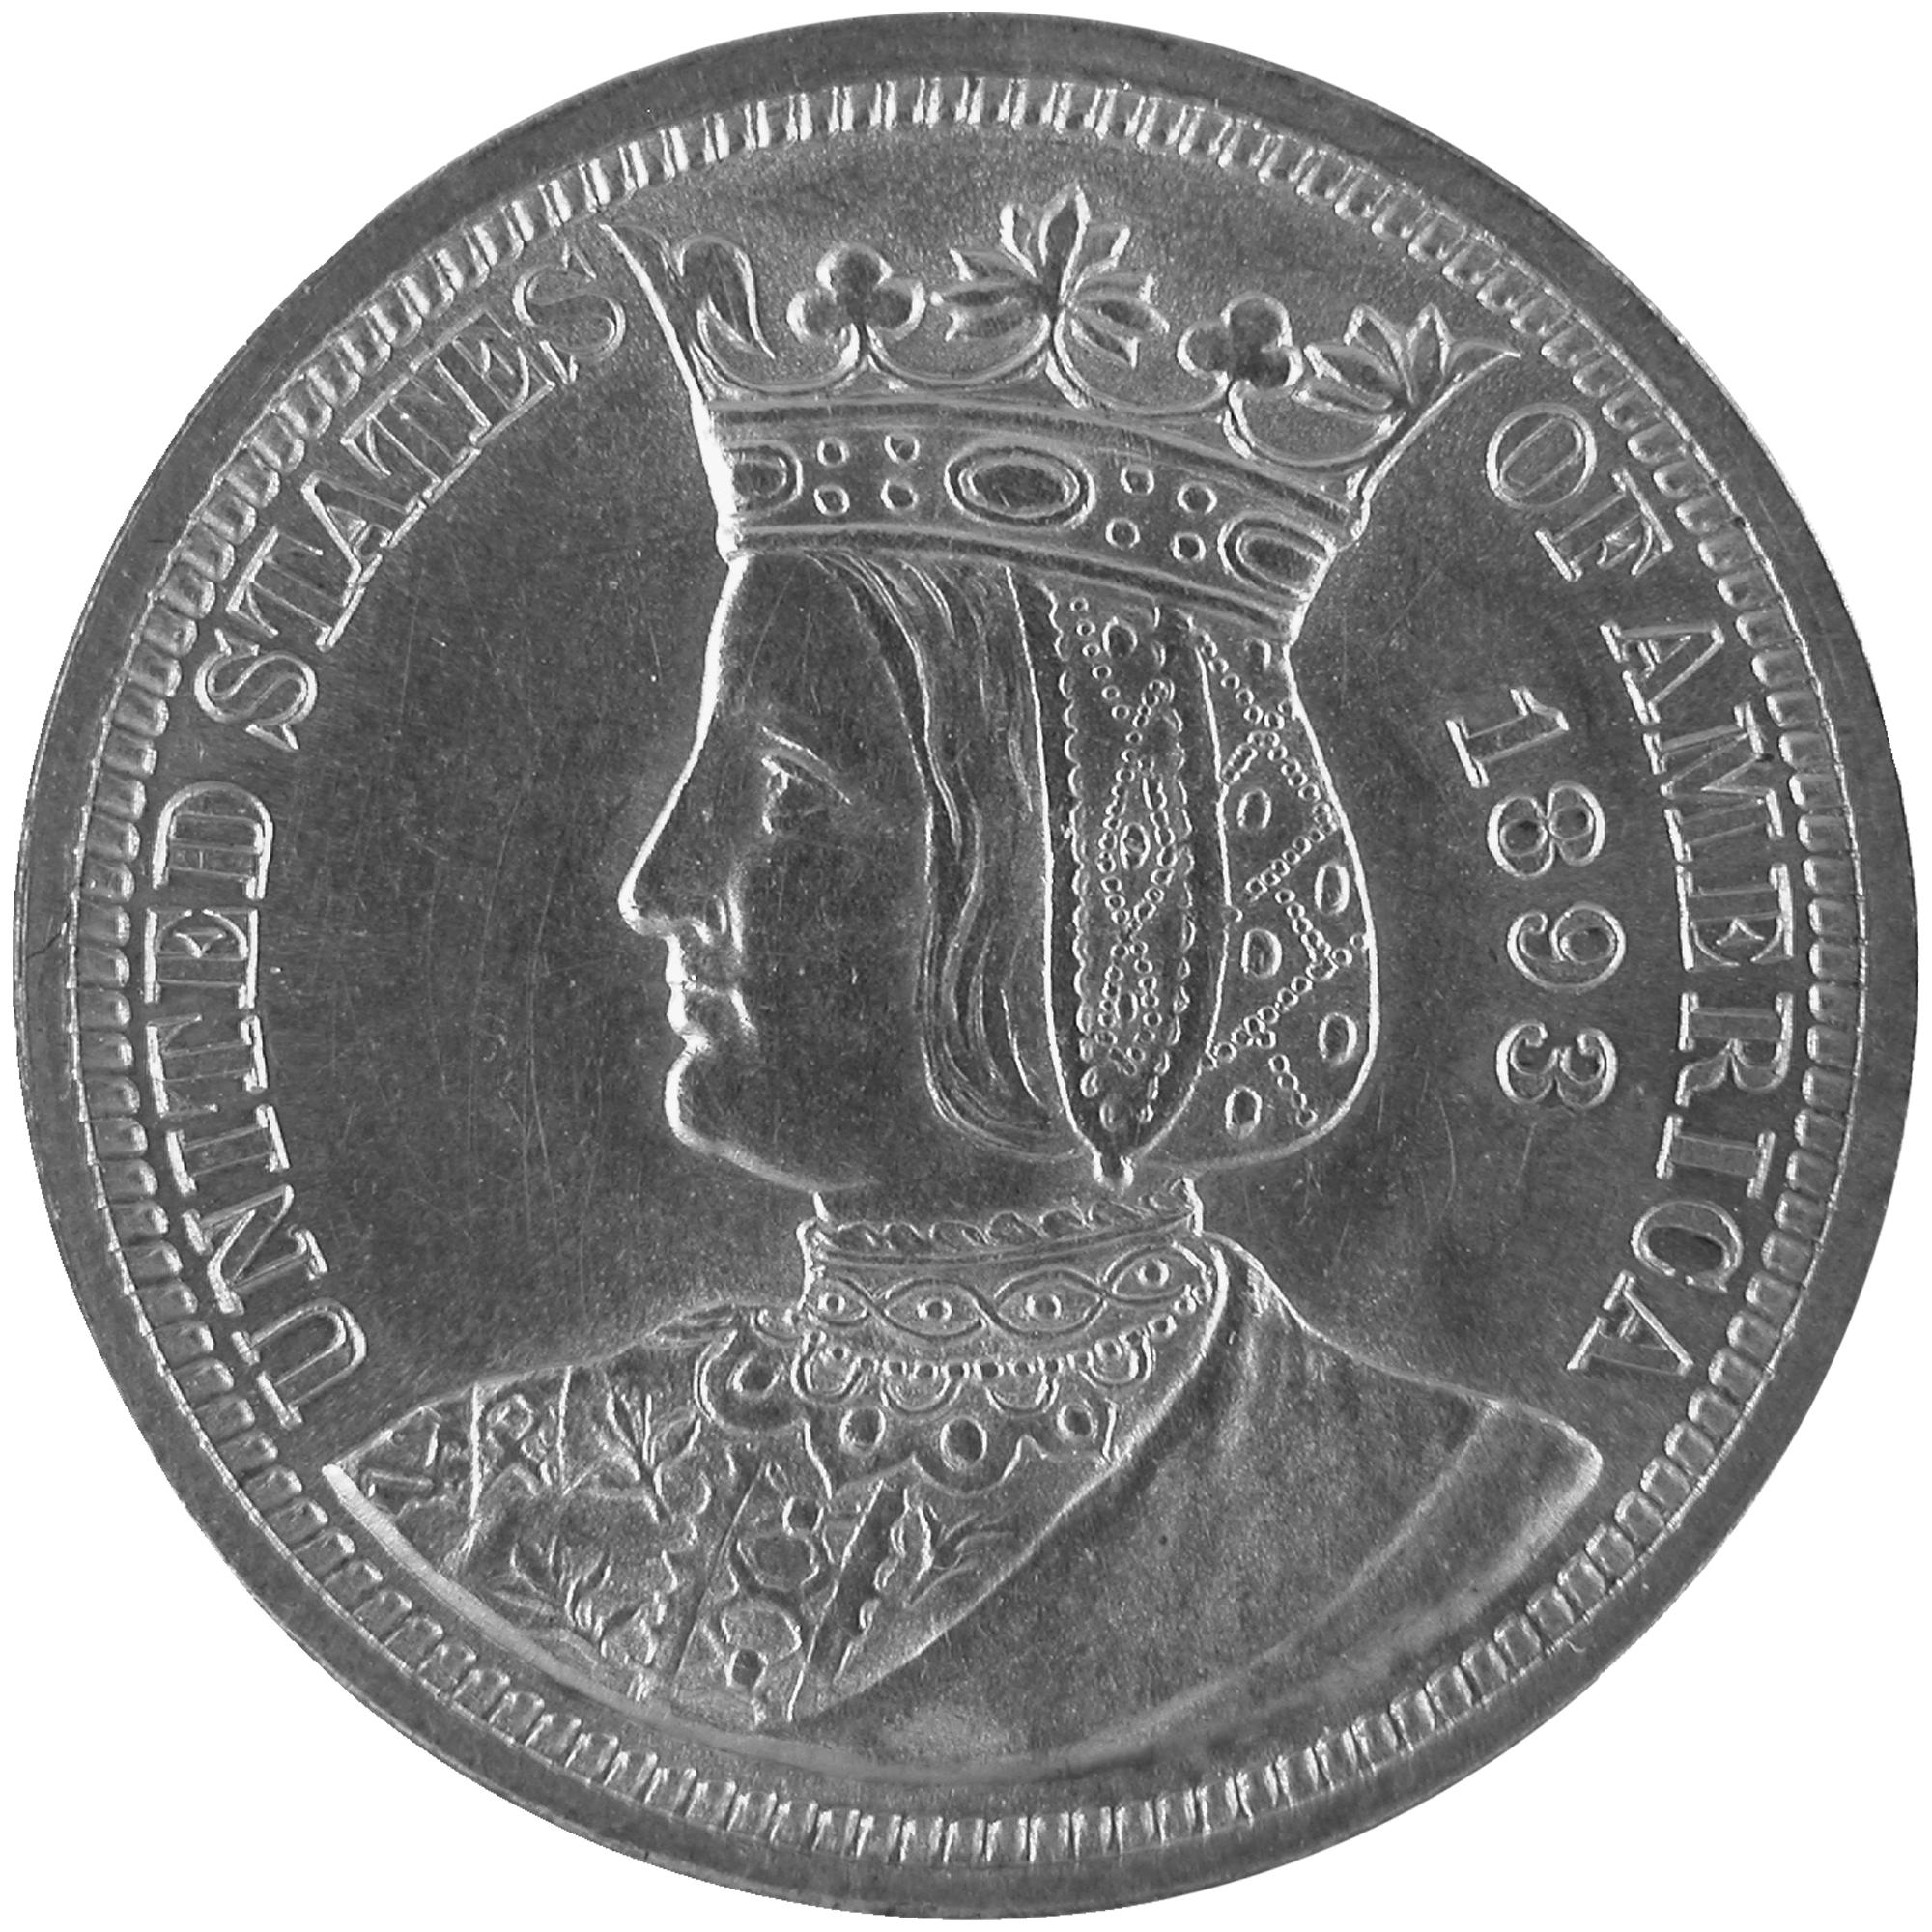 1893 Queen Isabella Commemorative Silver Quarter Dollar Coin Obverse